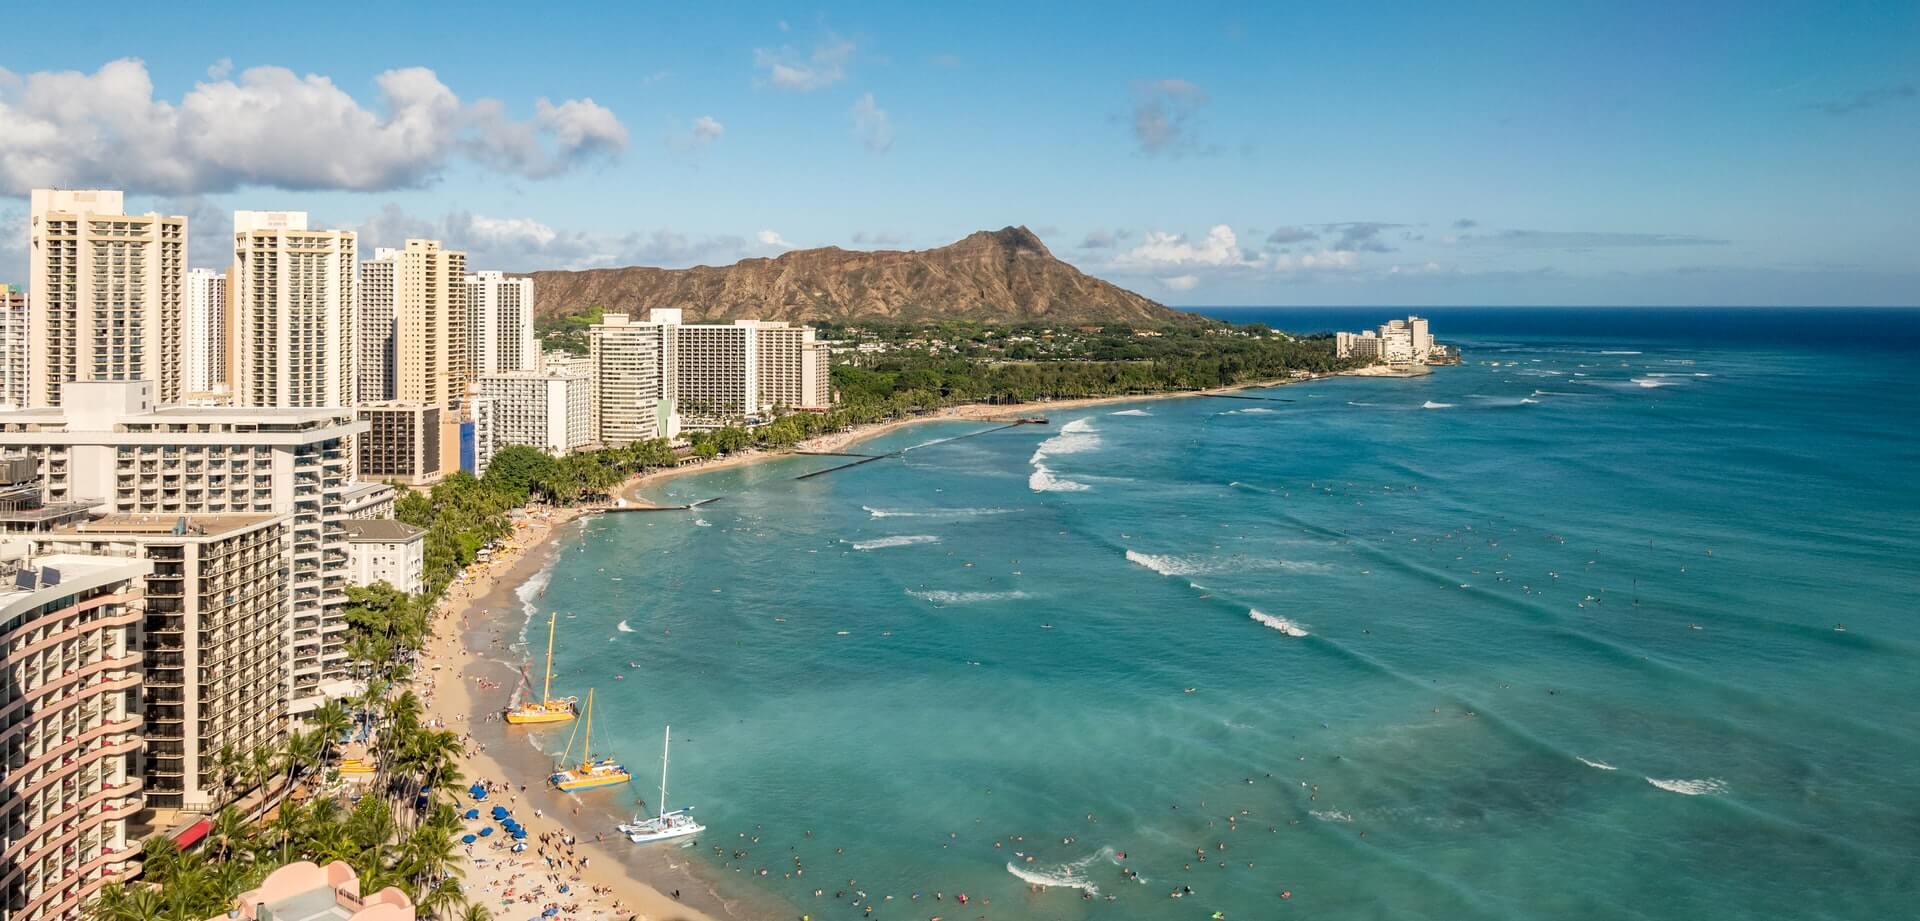 Picture for Honolulu, HI